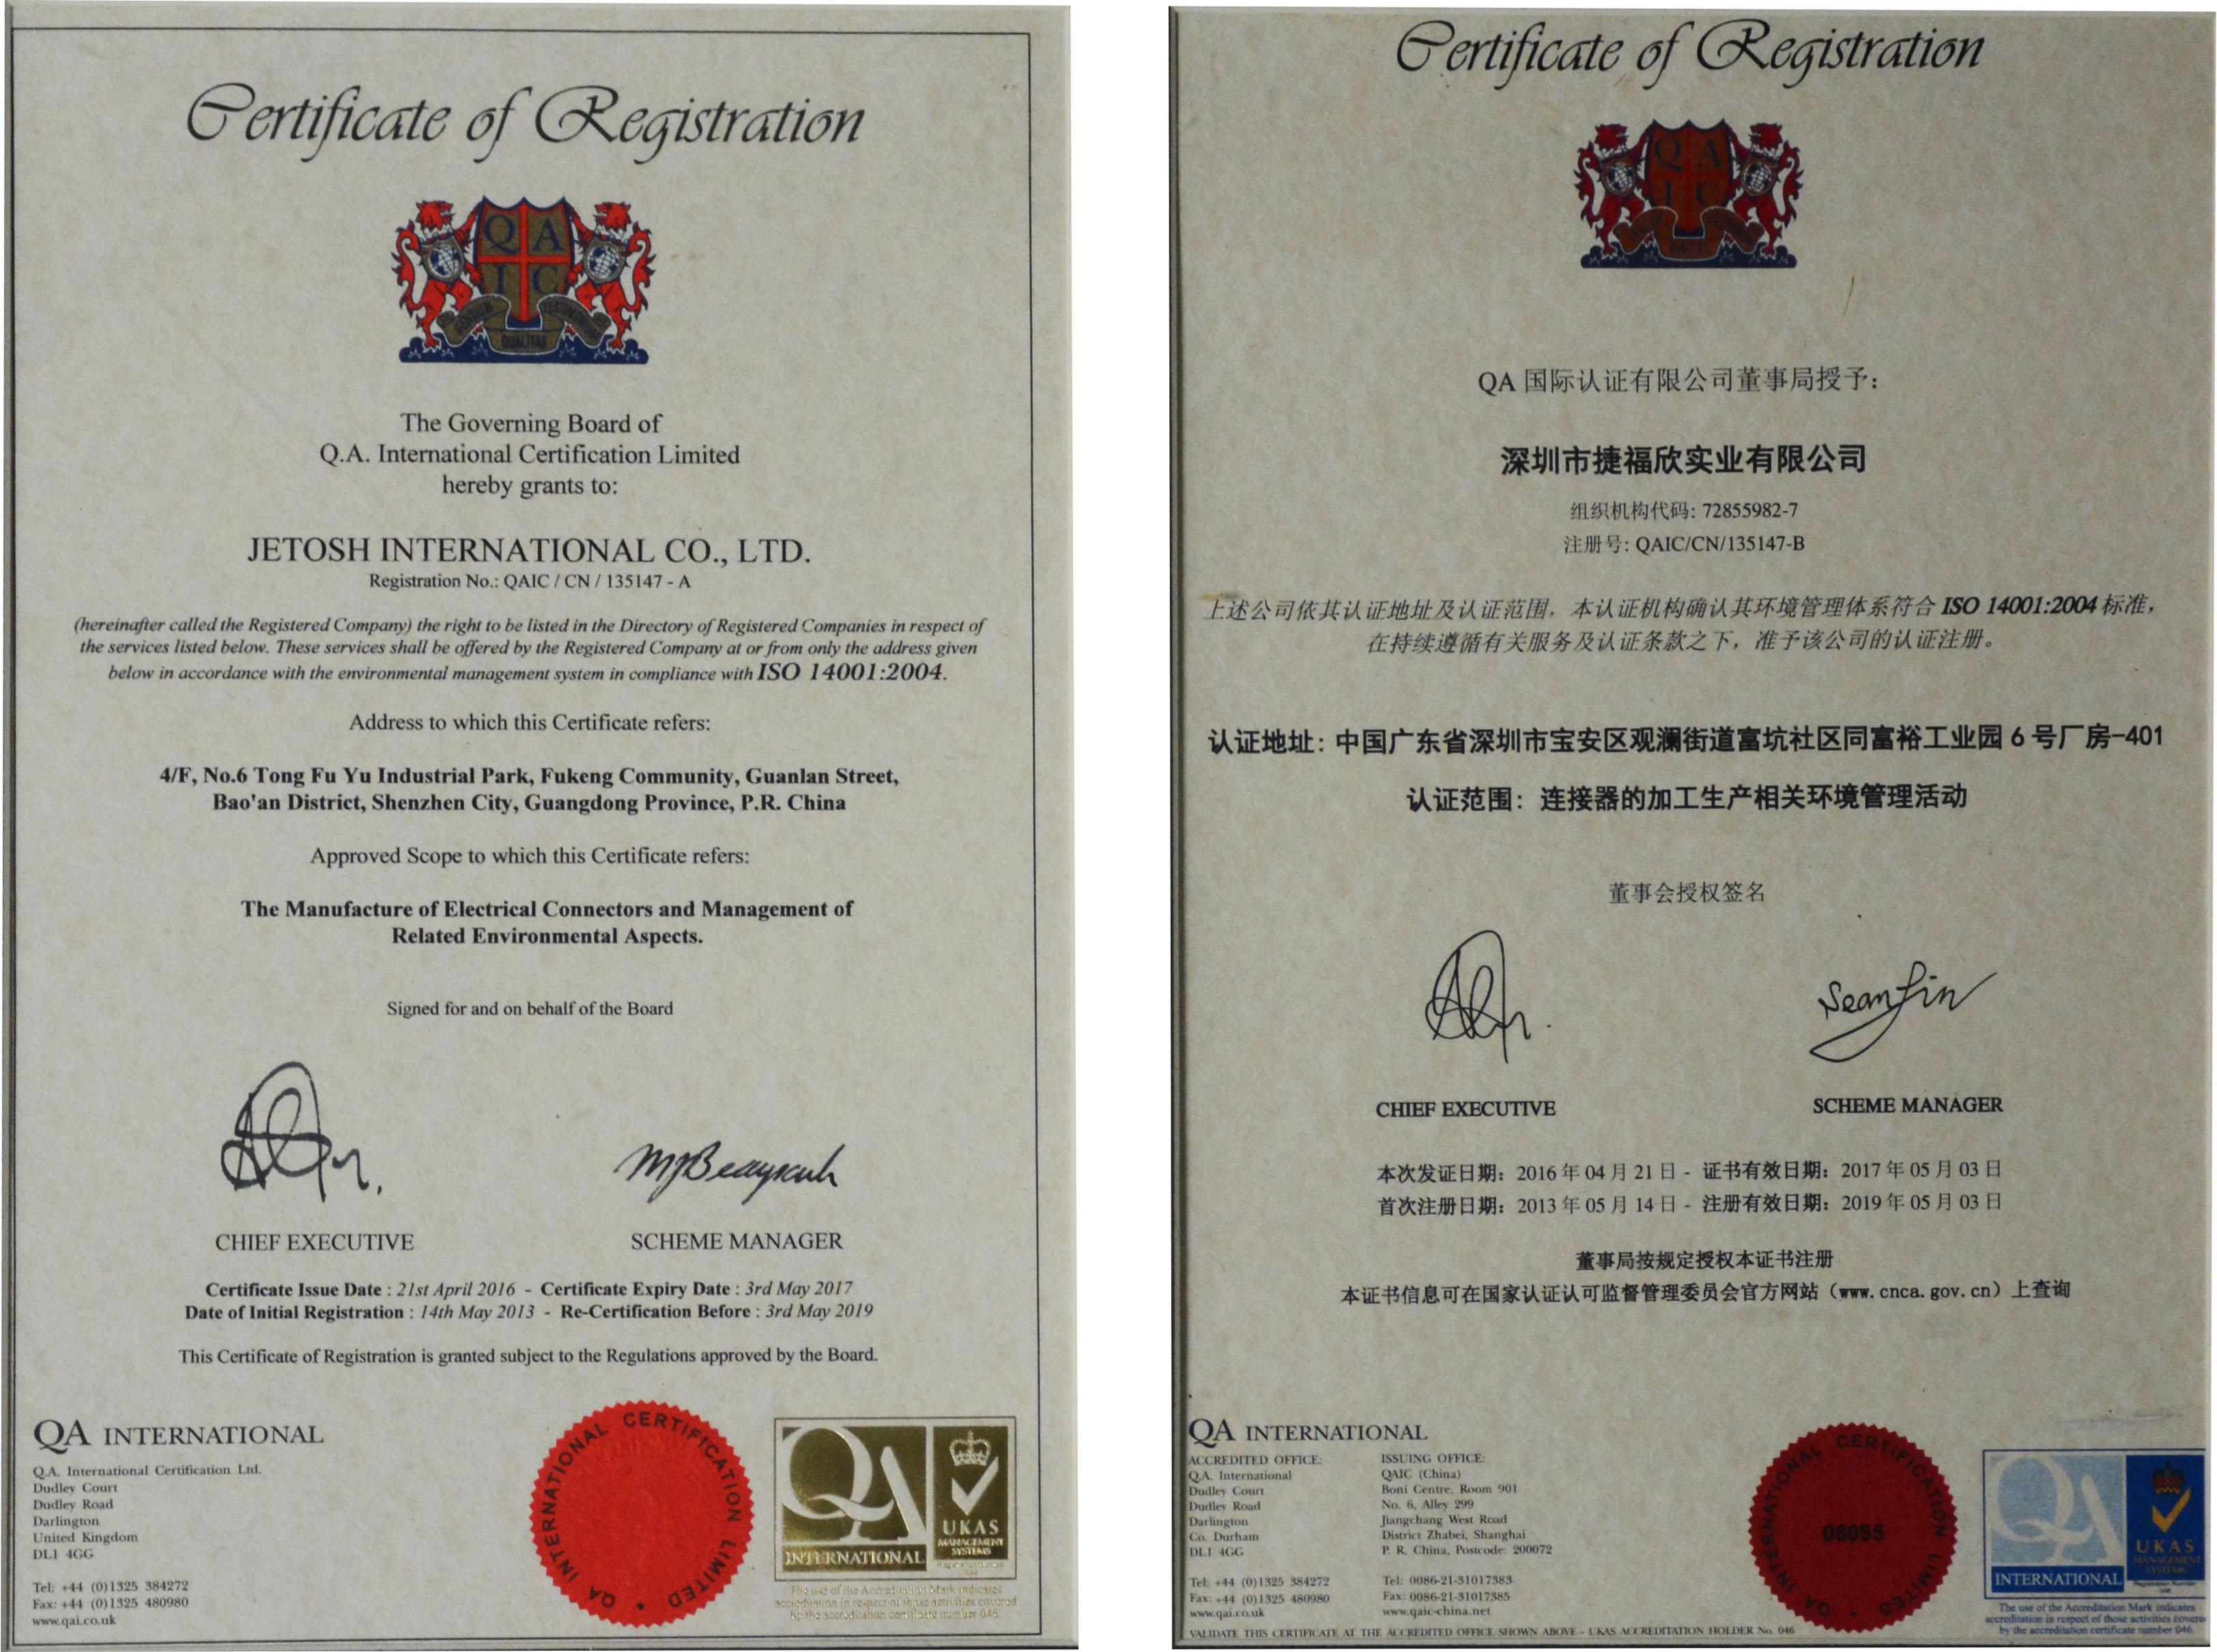 JETOSH Certificates: Learning Organization Award